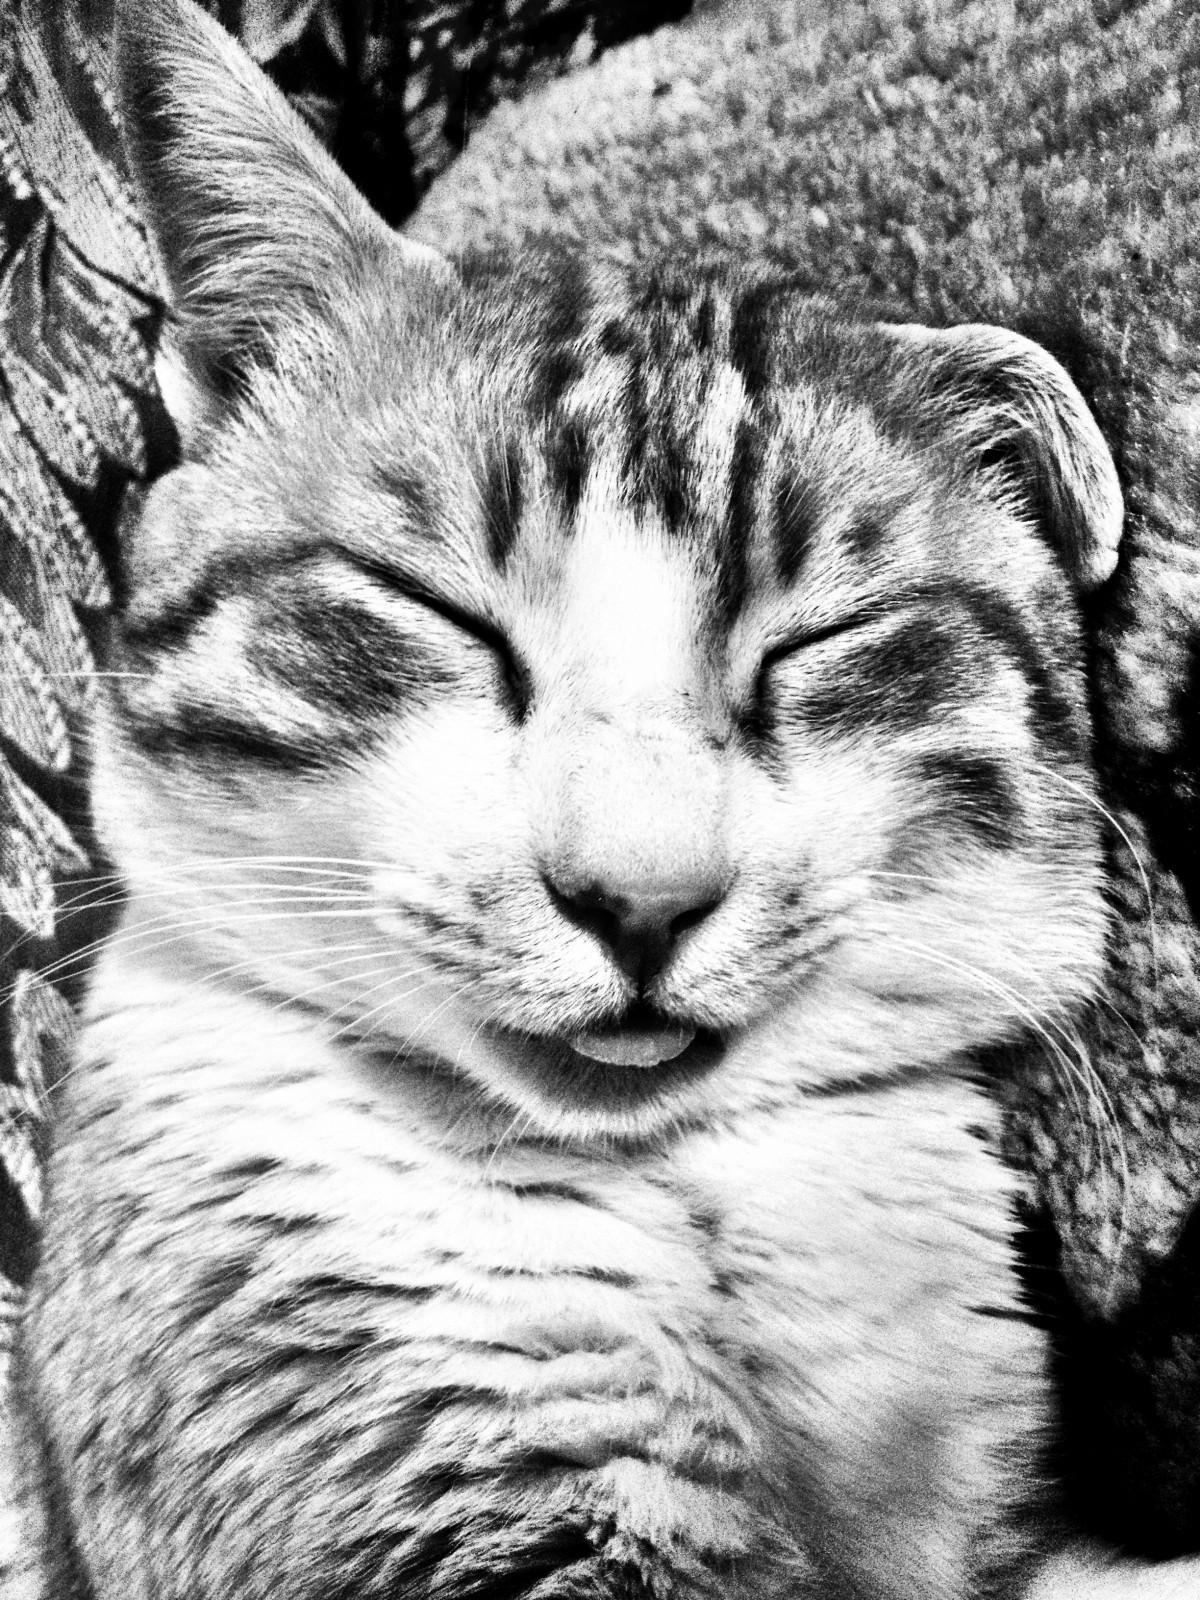 Gambar Kucing Ilustrasi godean.web.id